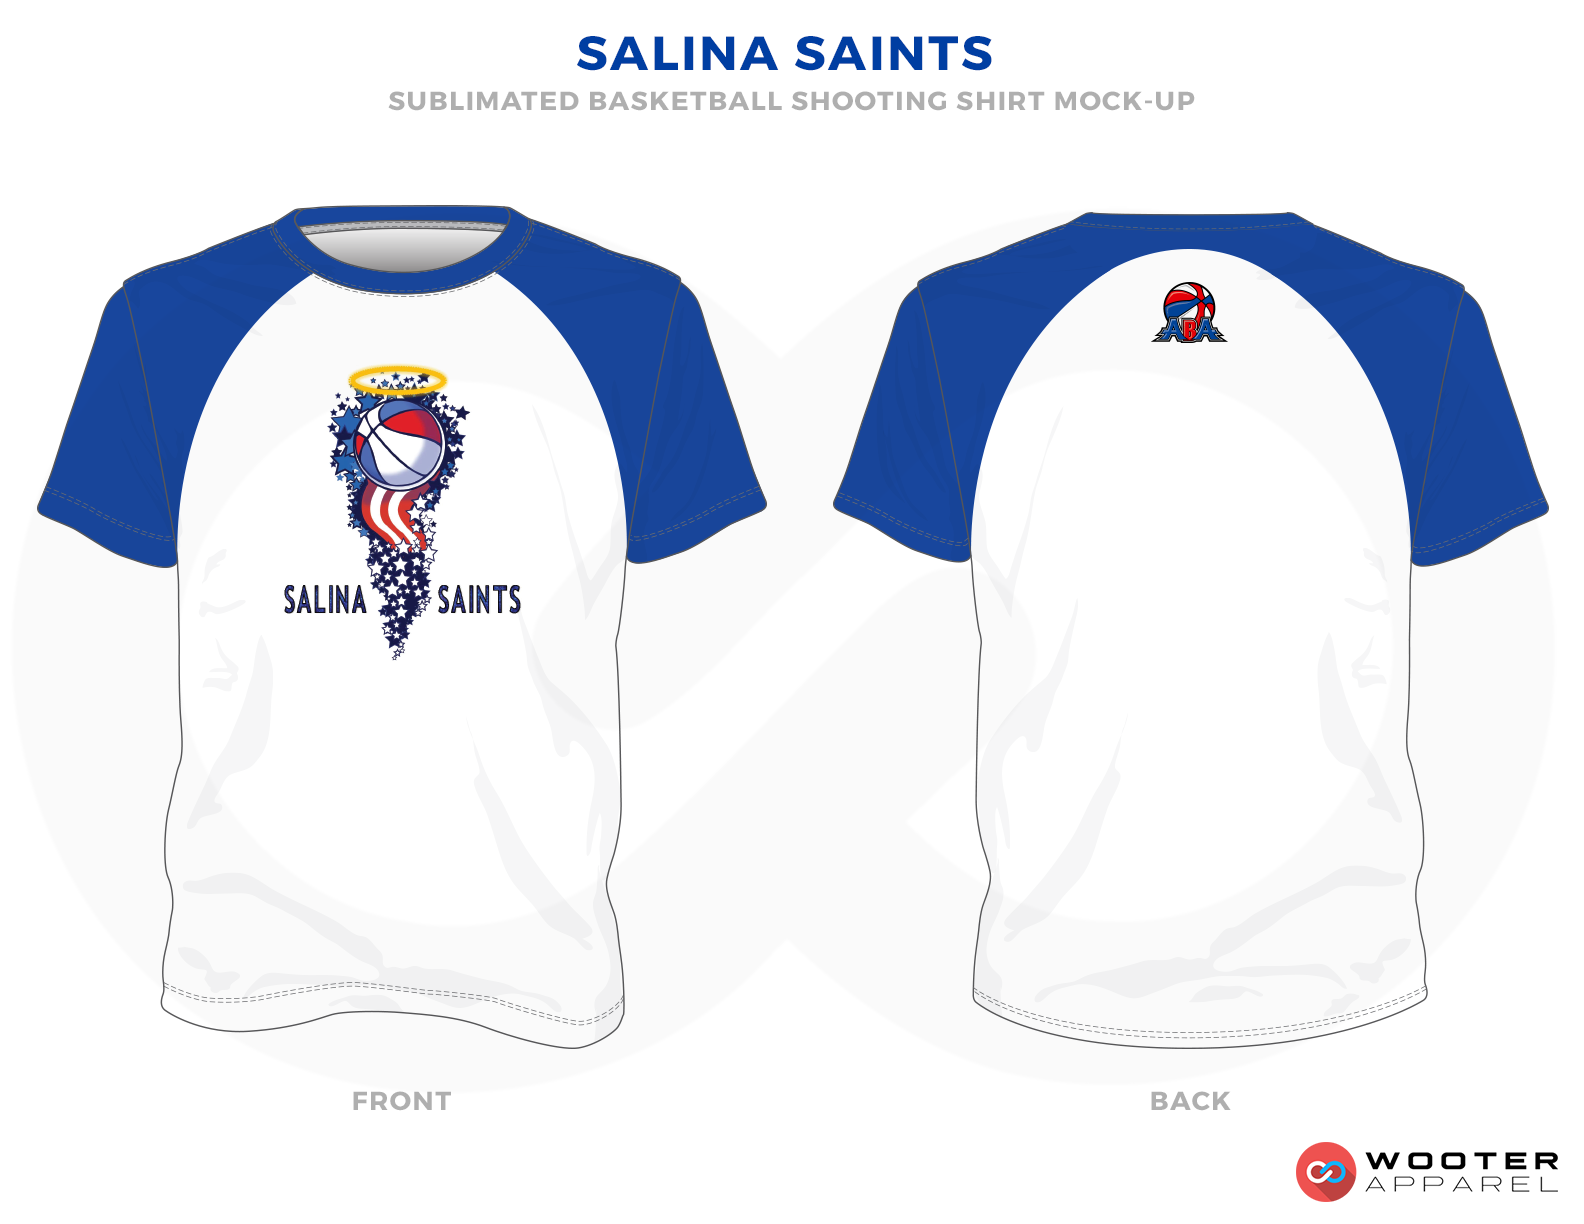 SalinaSaints-BasketballShootingShirt-Mockup.png